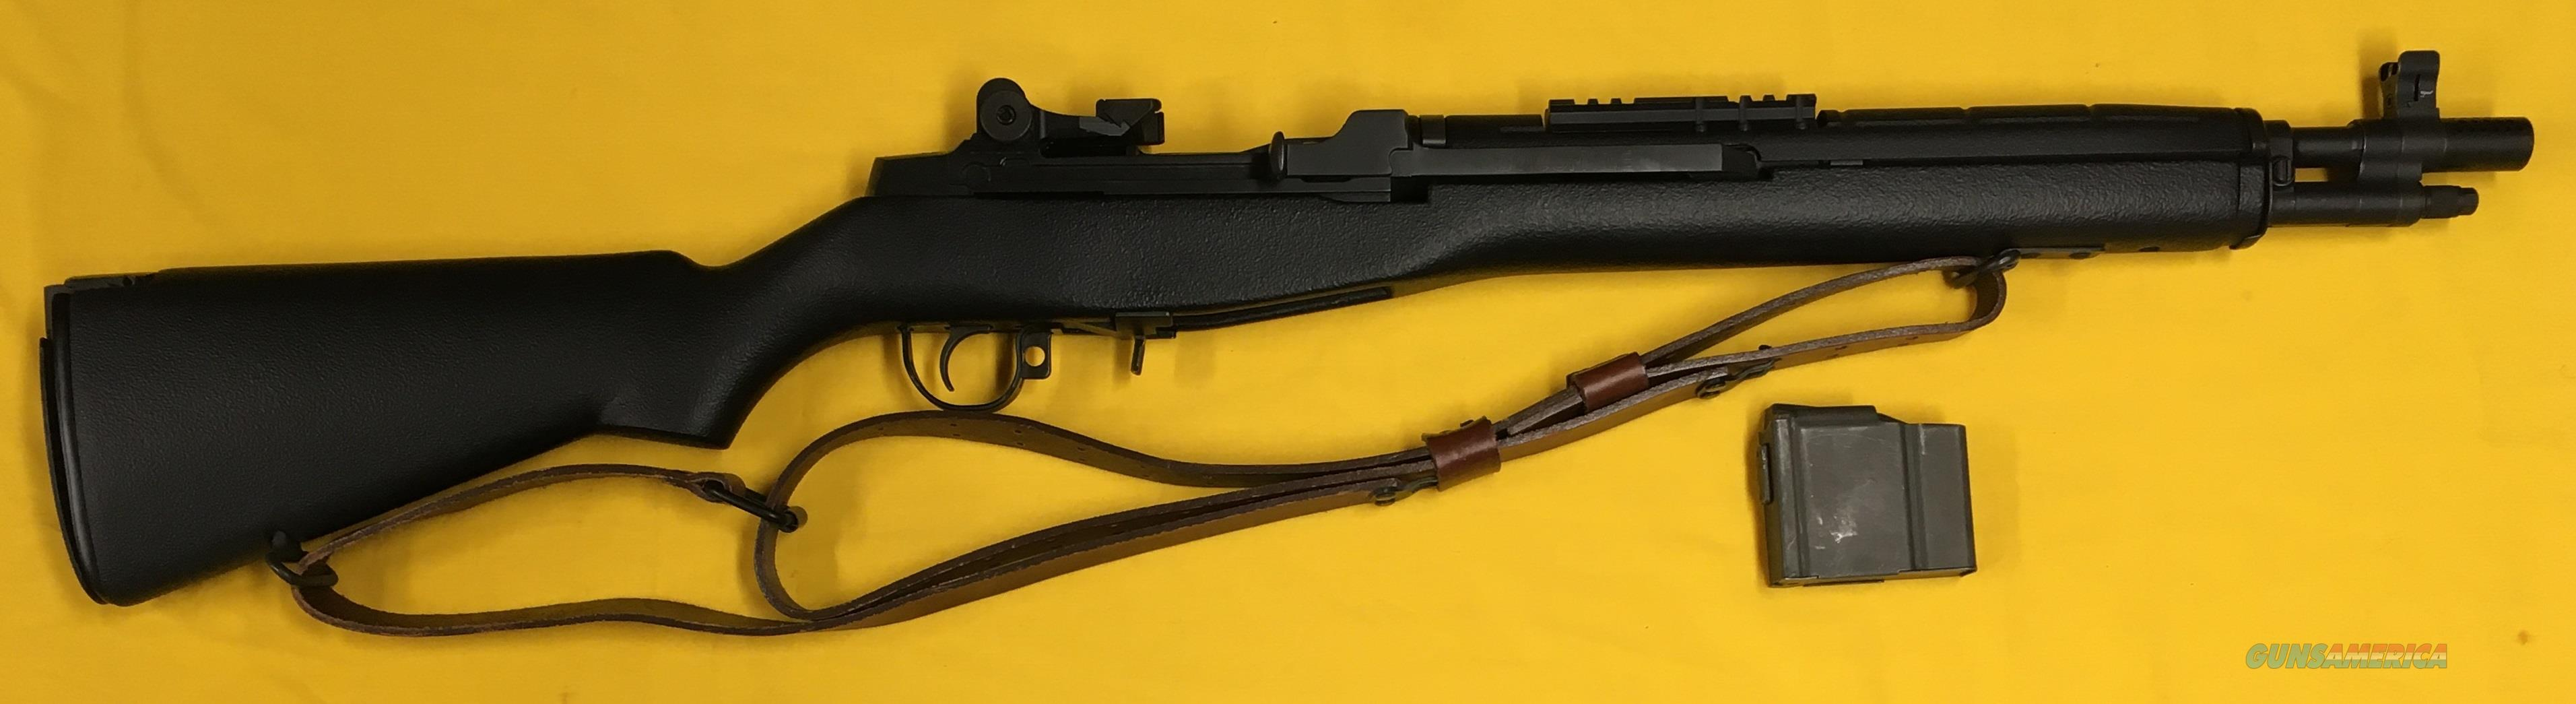 Springfield M1A SOCOM 16, semi-auto, .308 NATO  Guns > Rifles > Springfield Armory Rifles > M1A/M14